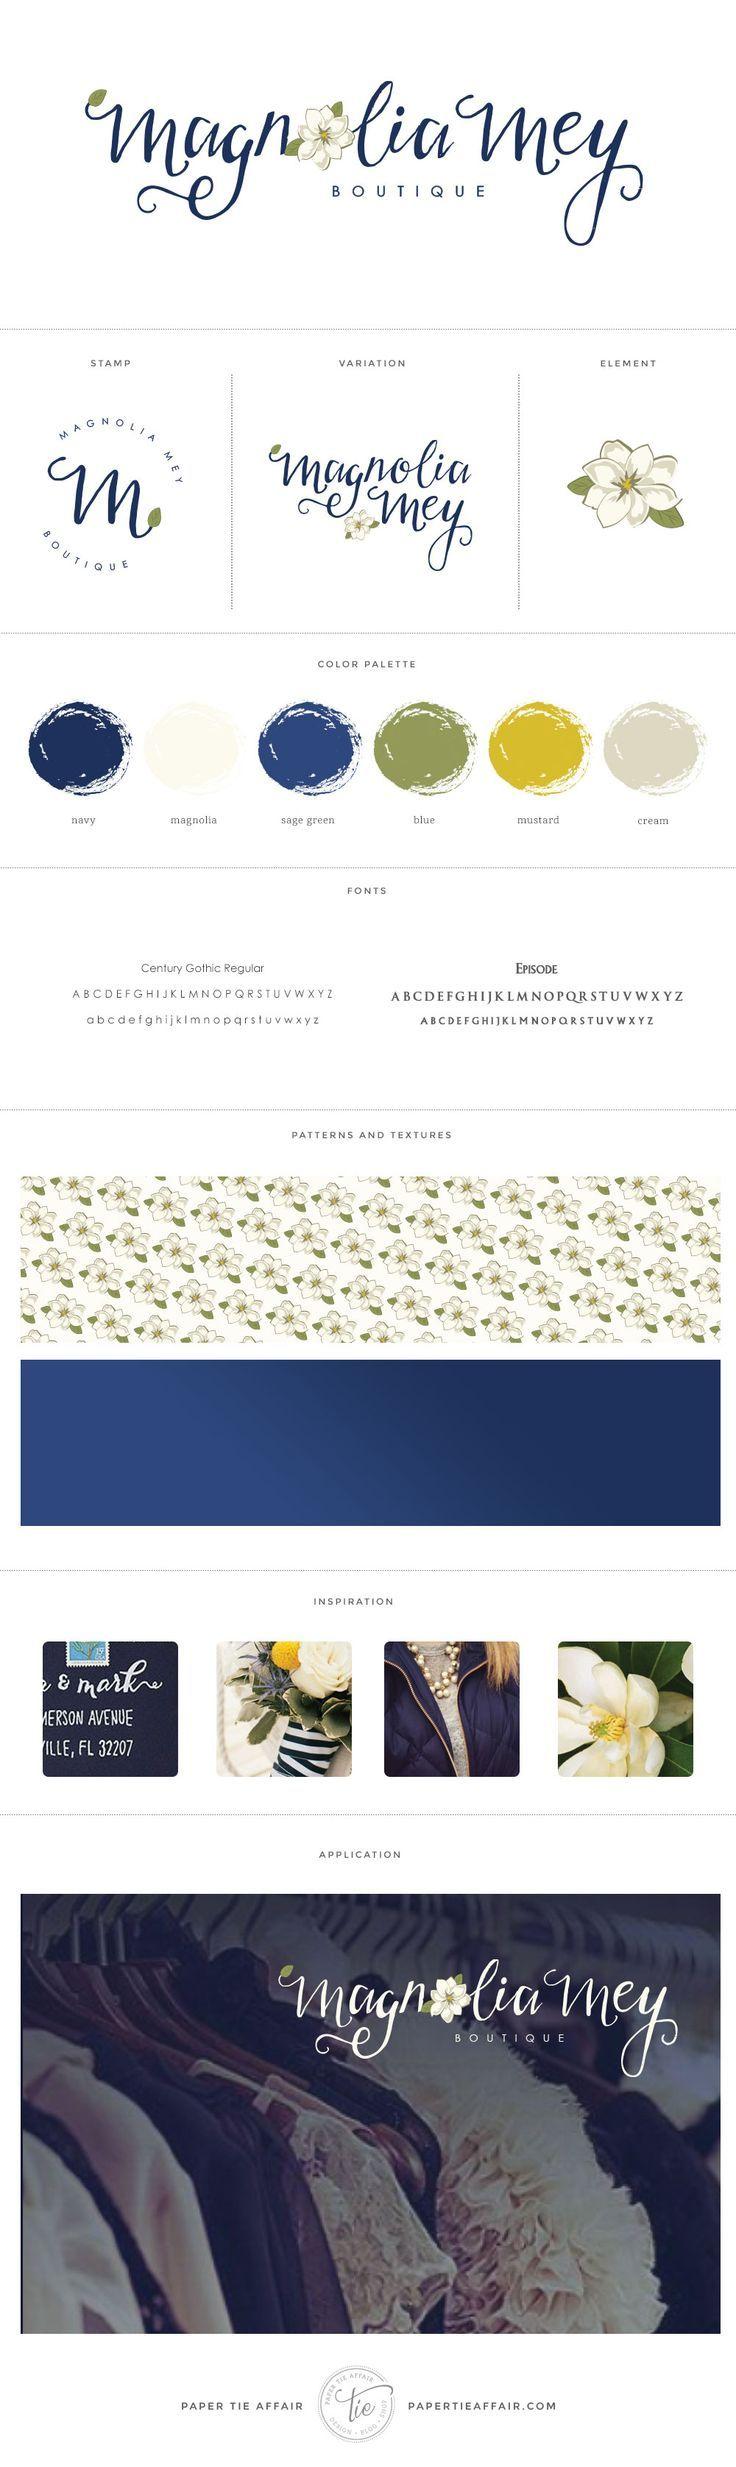 Magnolia Mey Boutique - Navy and green rustic modern logo design